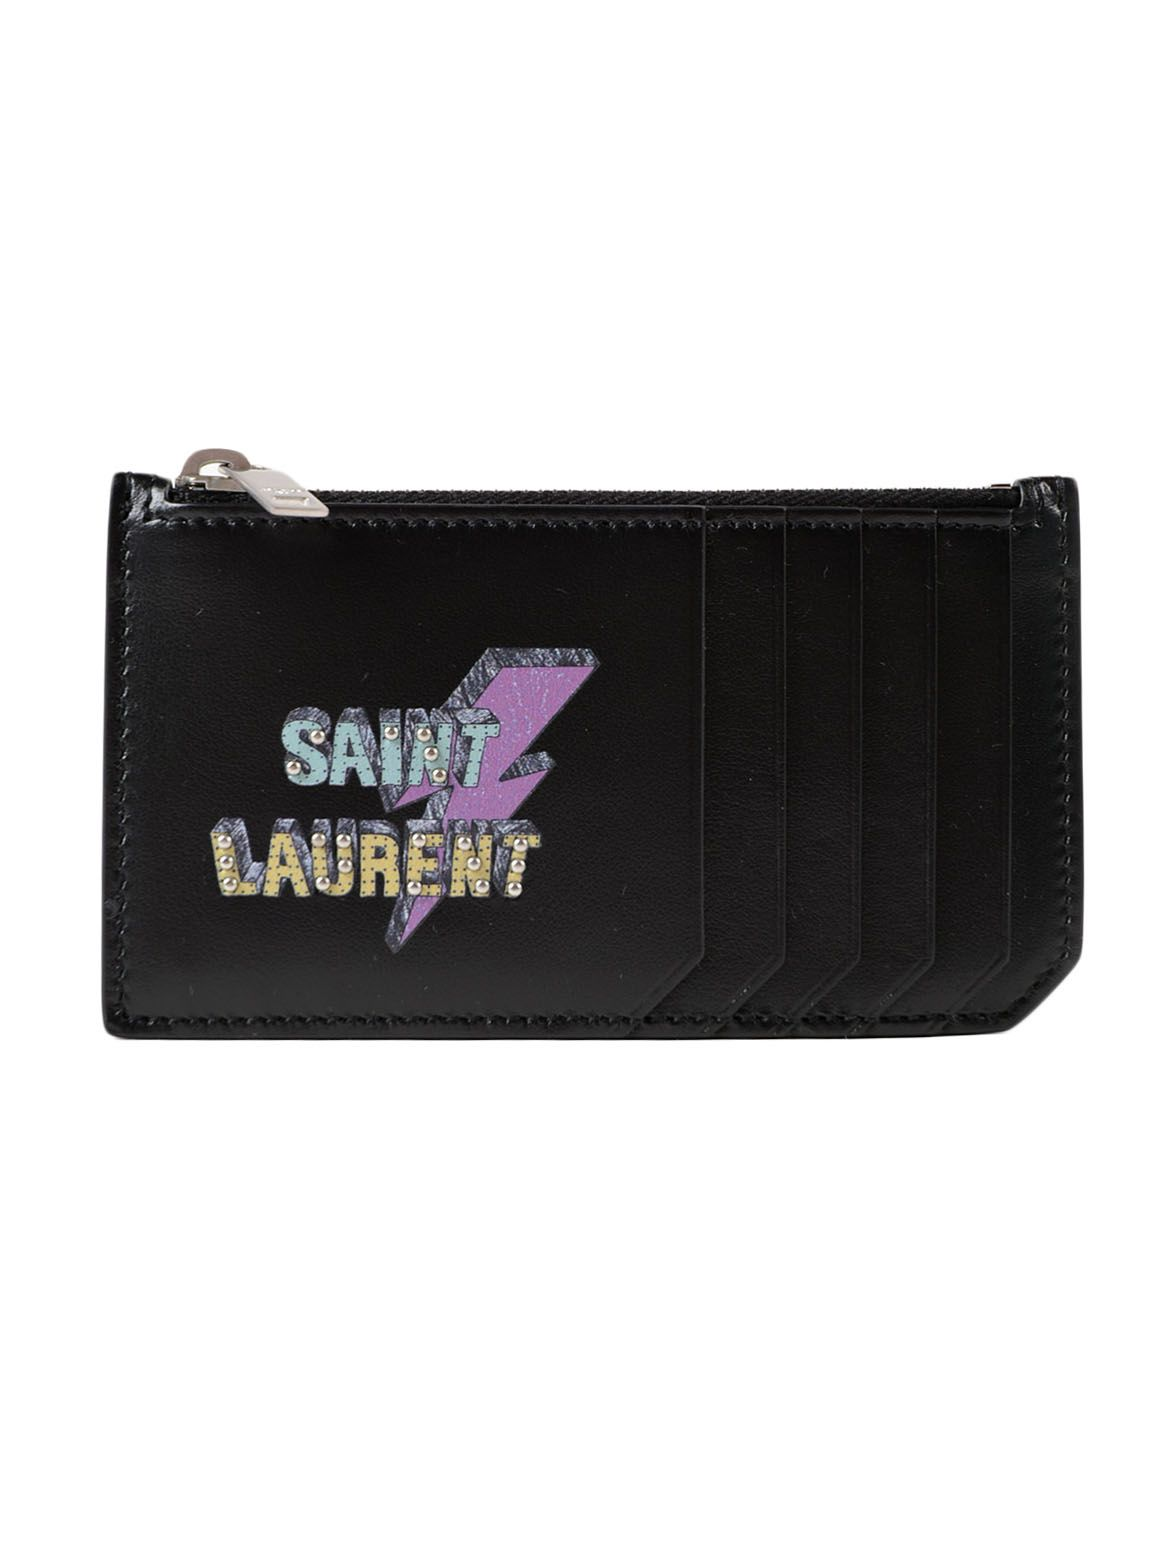 Saint Laurent Zipped Credit Card Holder